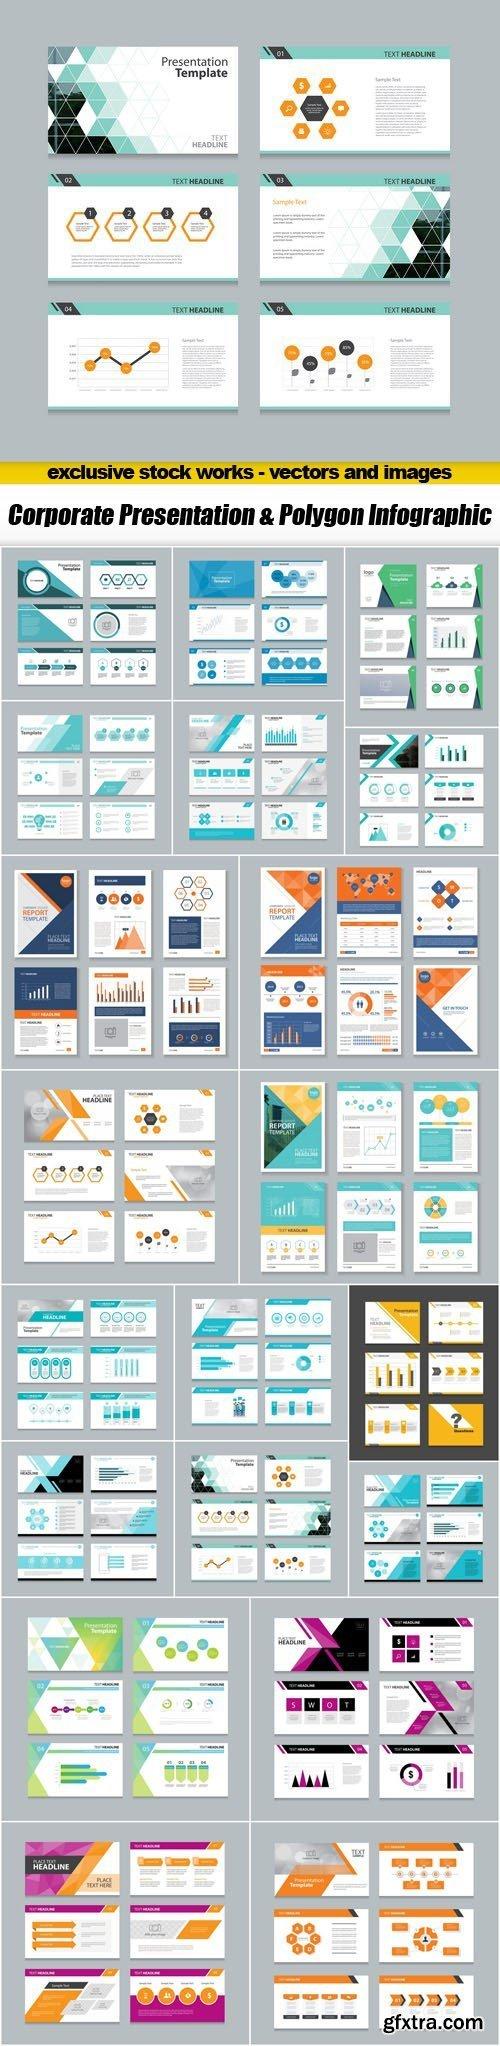 Сorporate Presentation & Polygon Infographic - 20xEPS